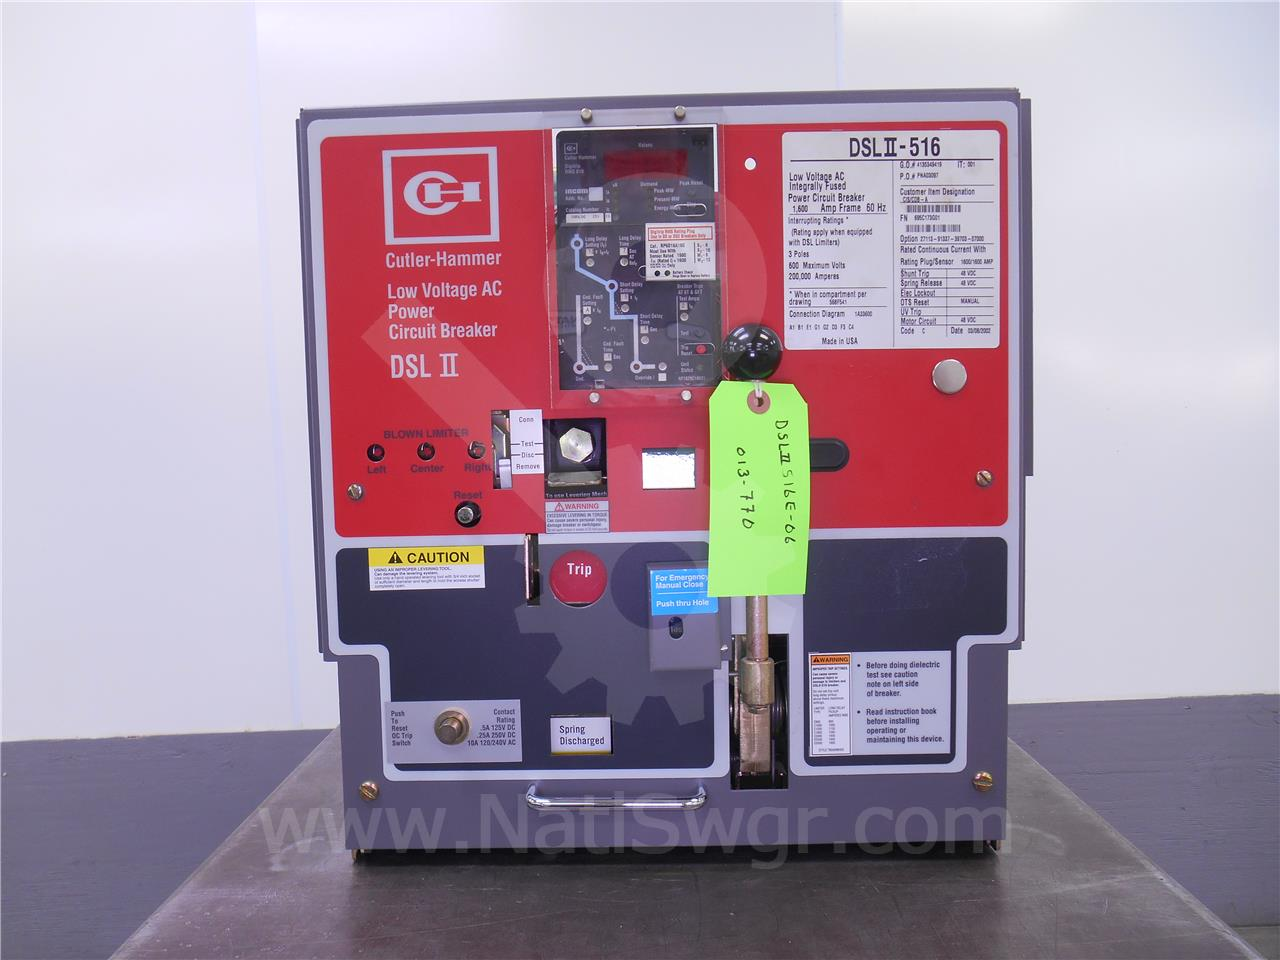 DSLII-516 1600A Cutler-Hammer EO/DO